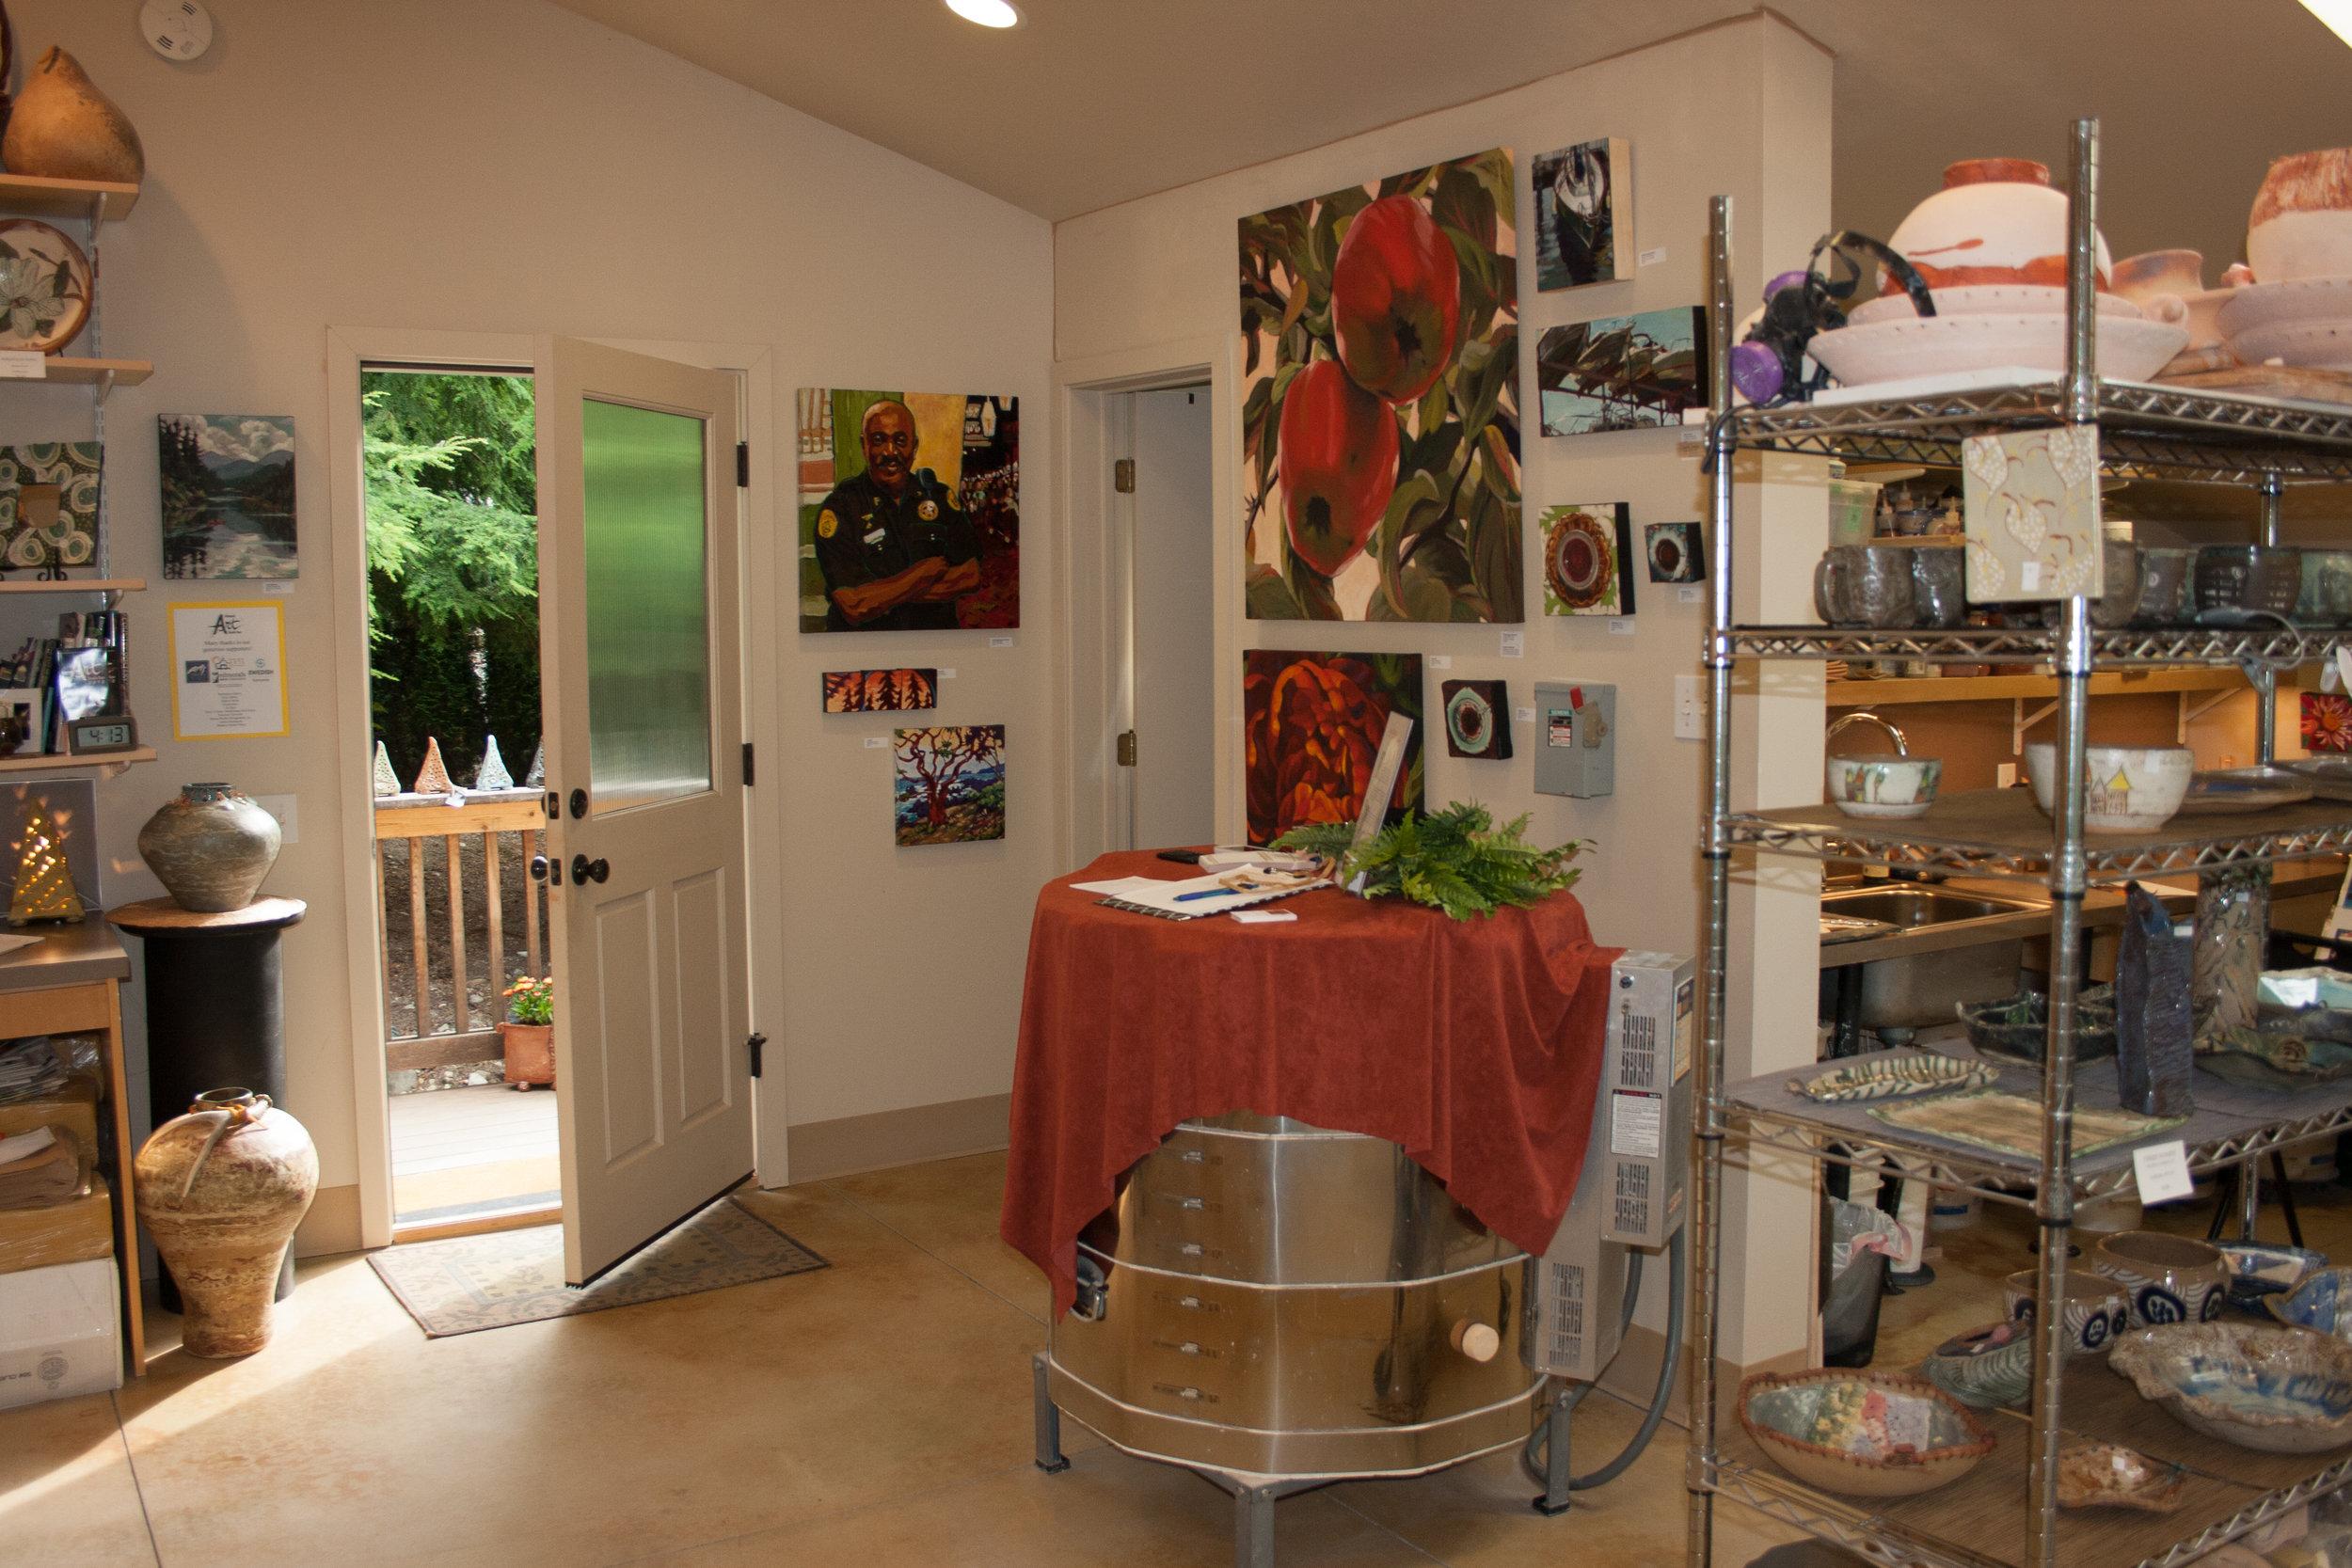 Barbara Wyatt's amazing ceramics studio where I show my work alongside her. This shot is from the 2014 tour.